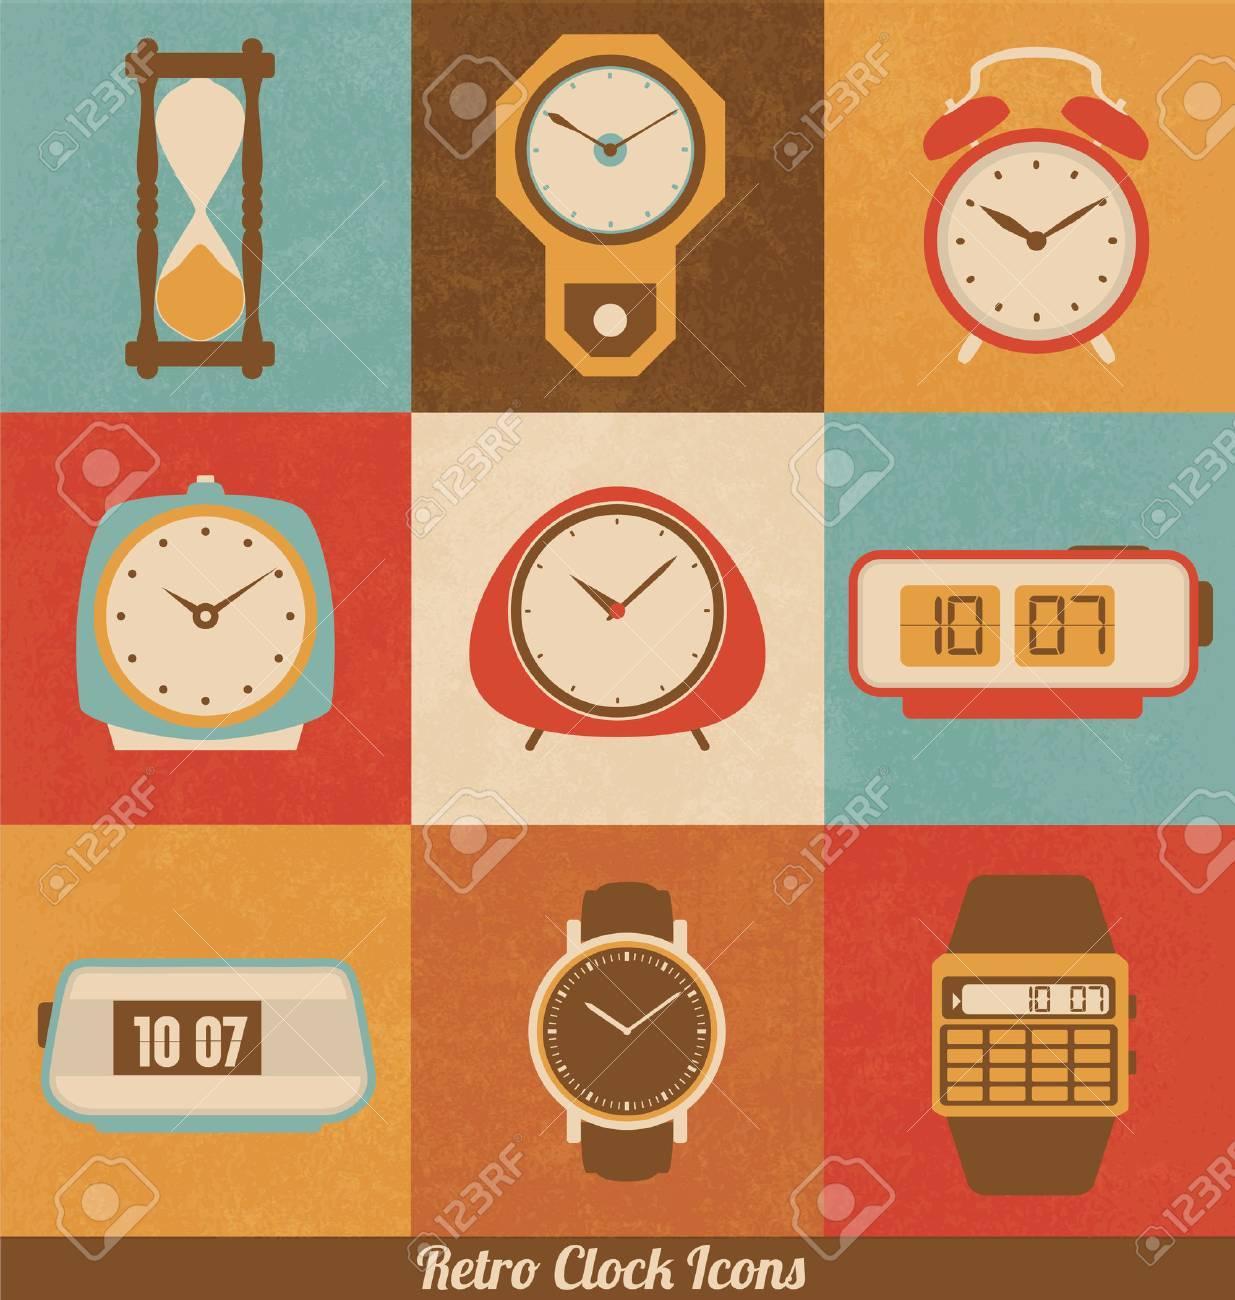 Retro Clock Icon Set - 33872316